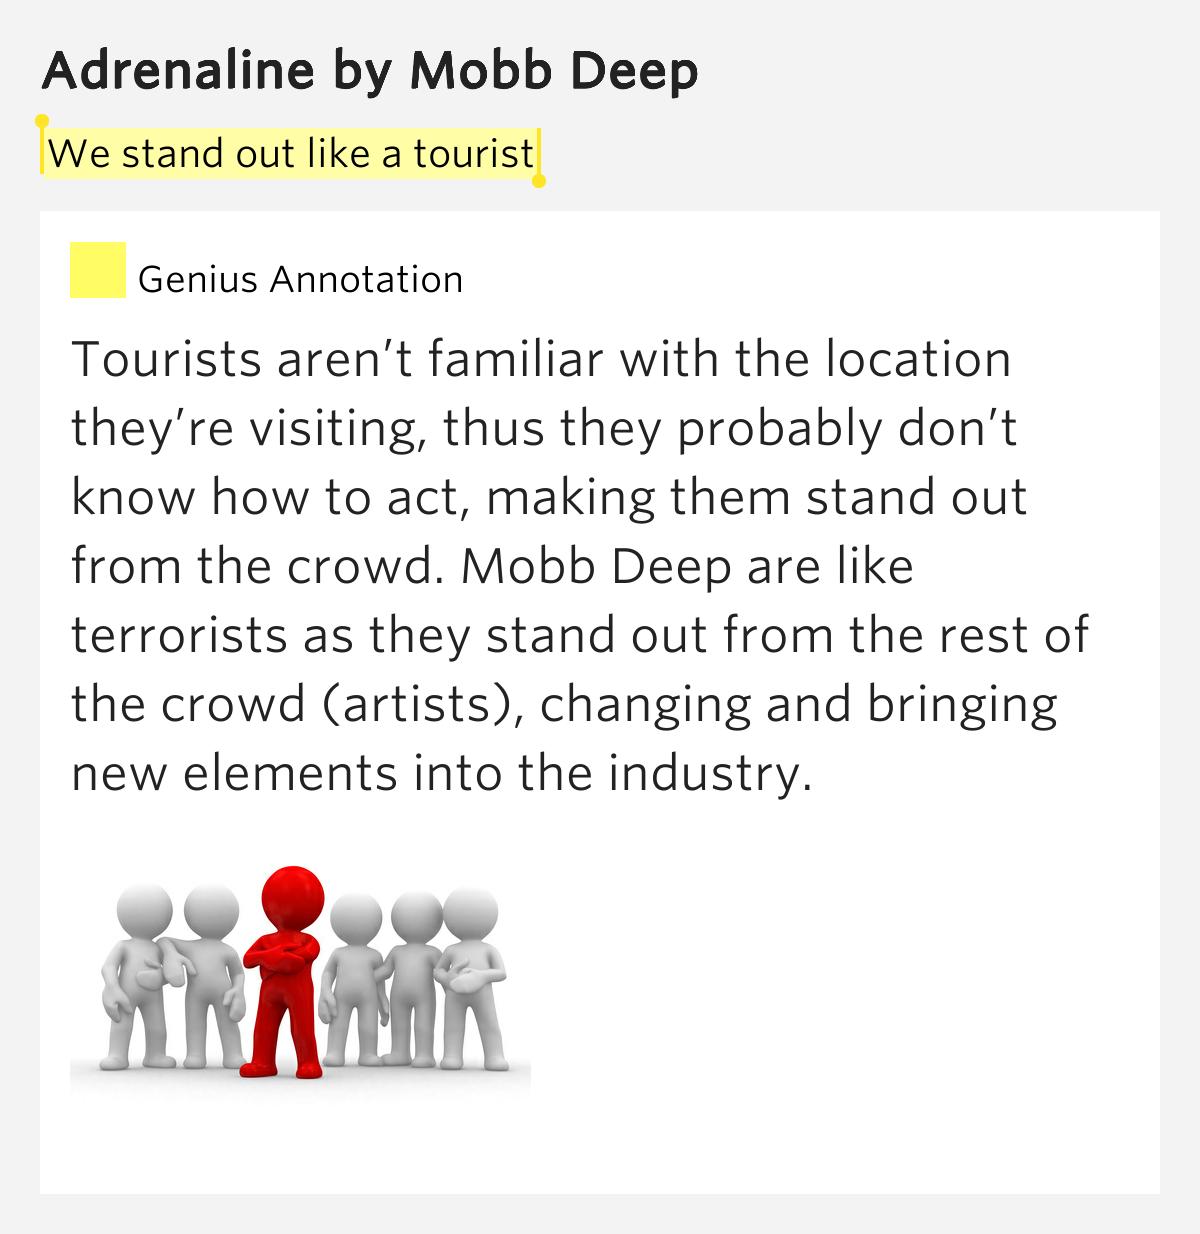 Gavin Rossdale - Adrenaline Lyrics | MetroLyrics